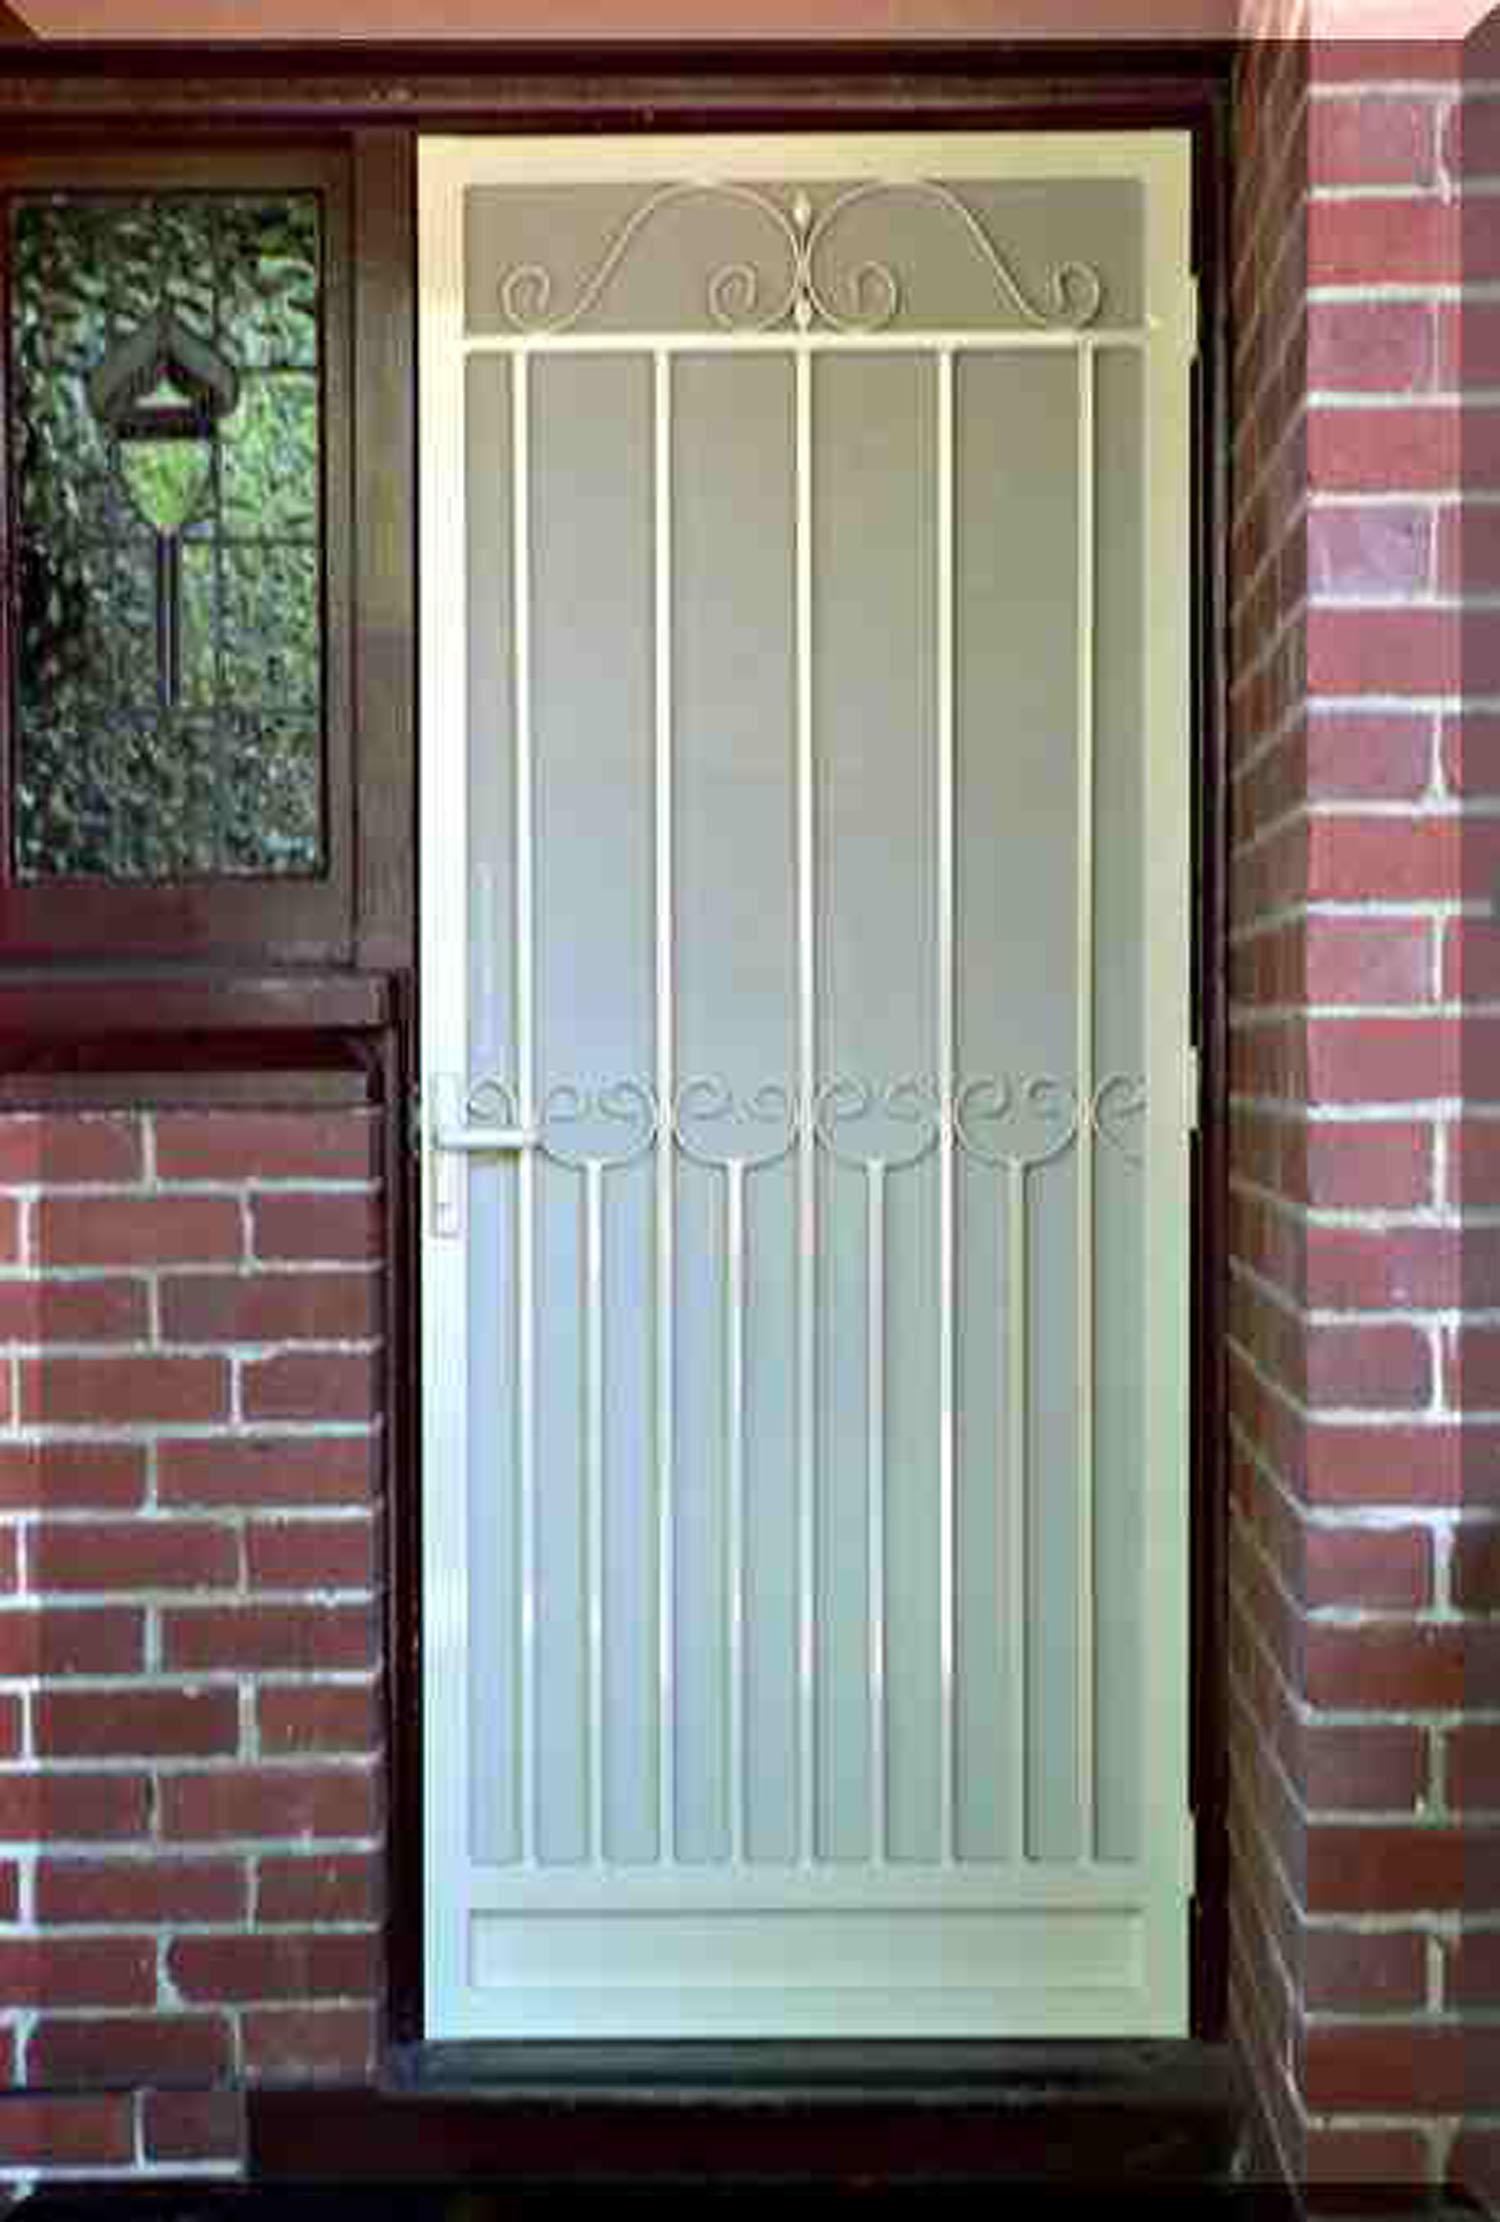 2222 #80504B Security Doors pic Residential Security Doors Exterior 41111500